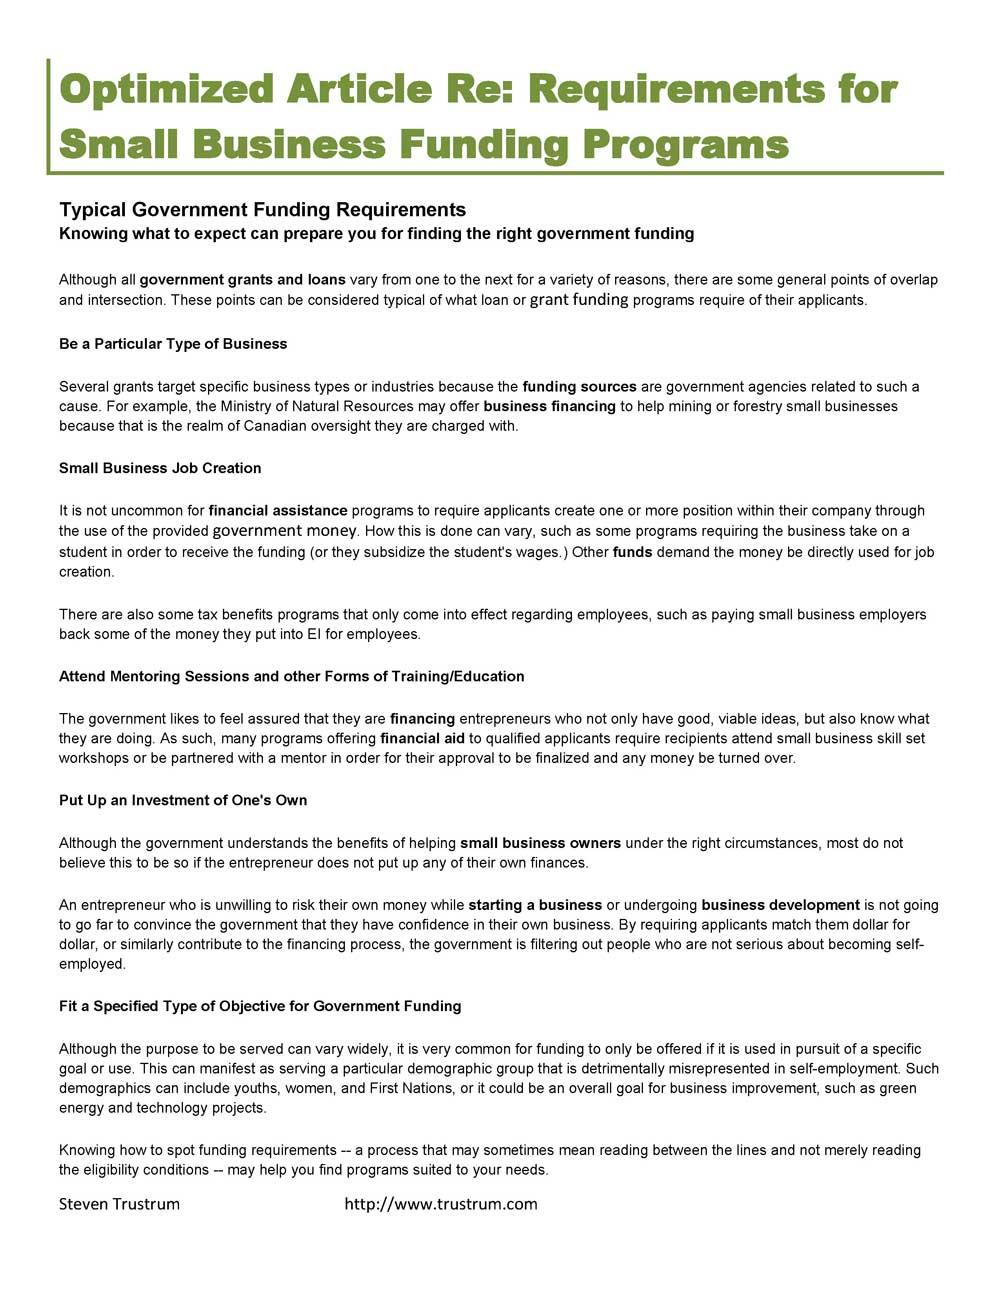 Steven Trustrum Business Funding Article